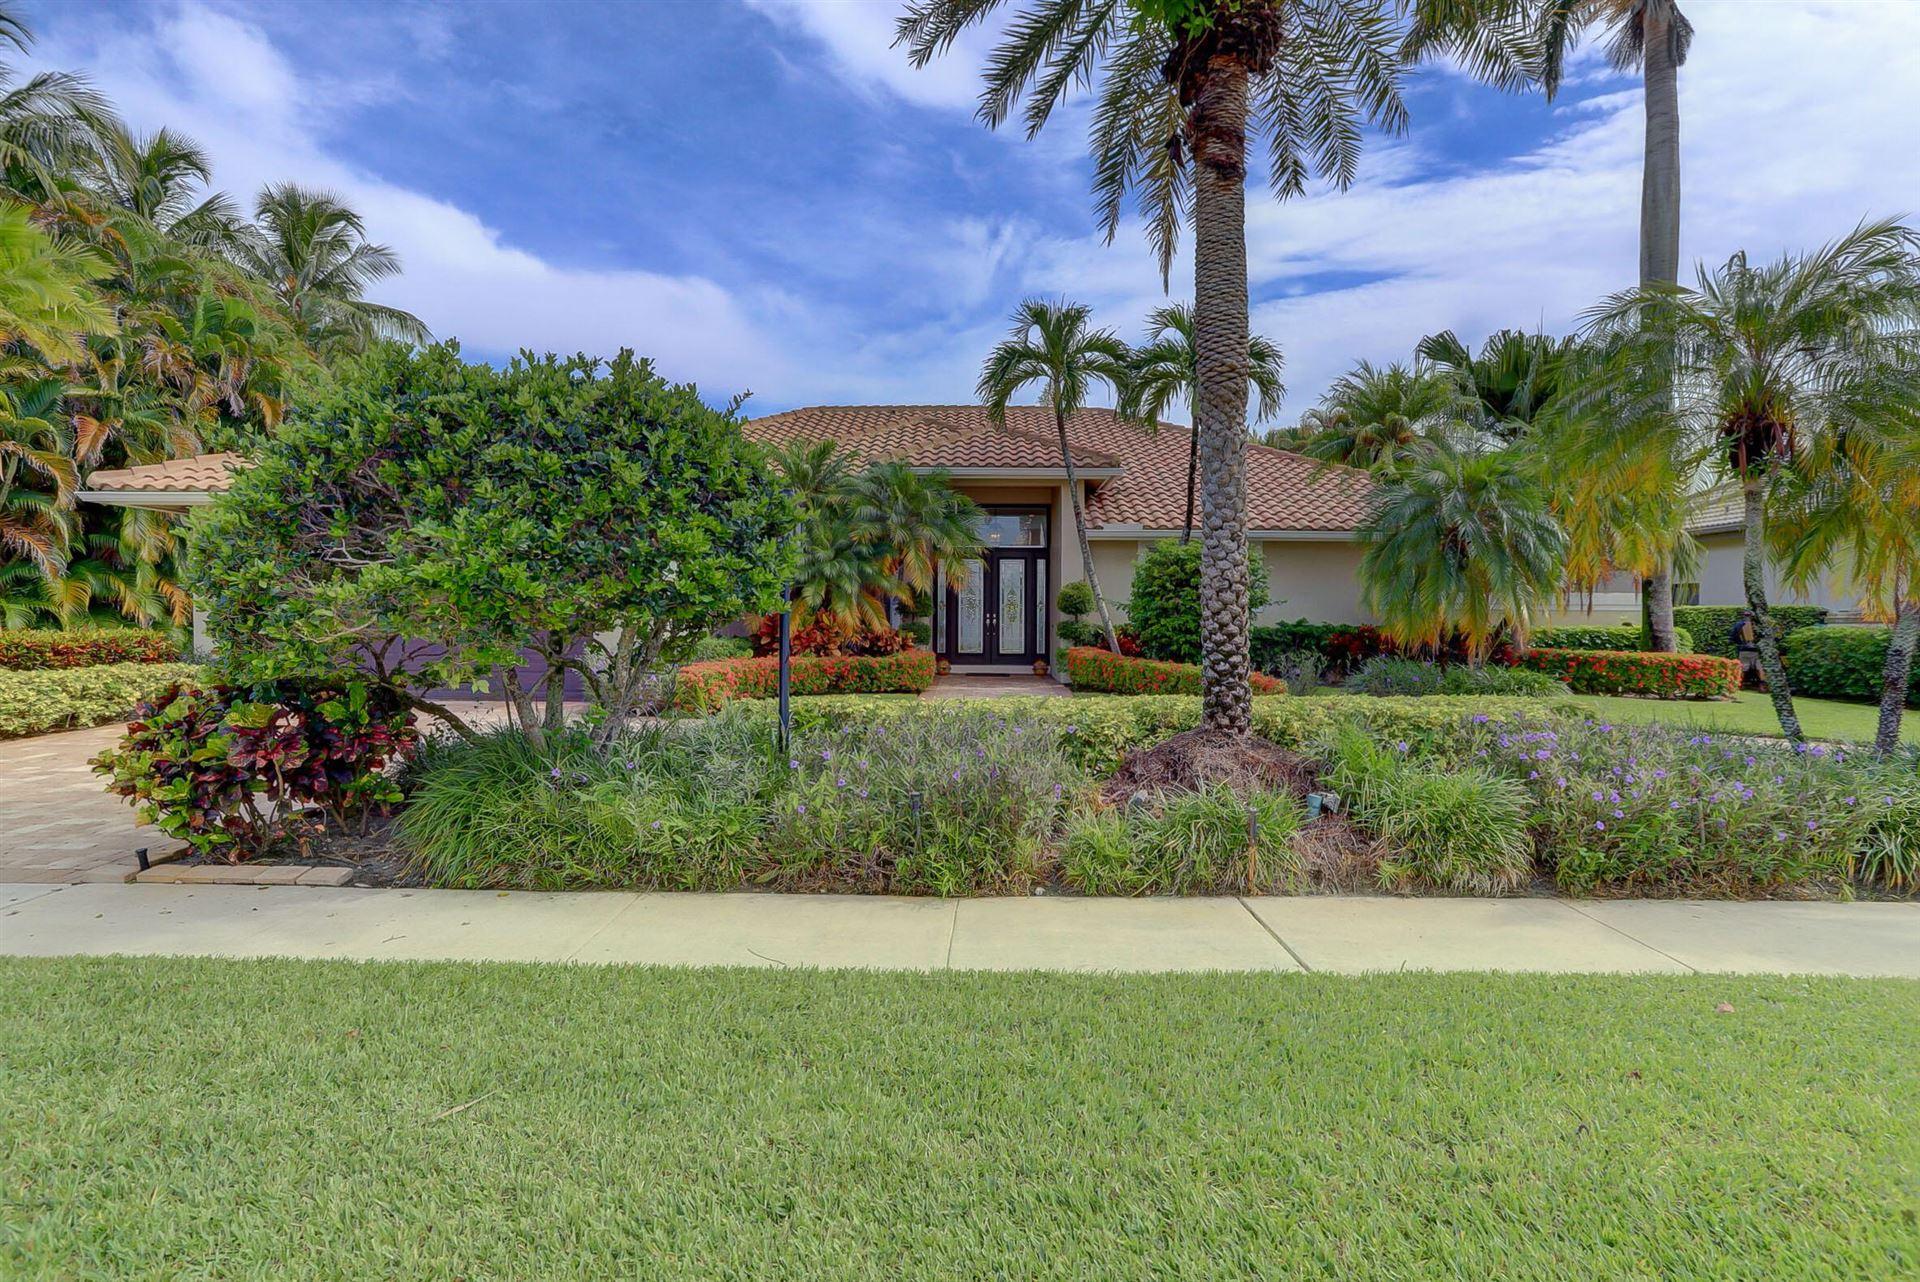 Photo of 10486 Stonebridge Boulevard, Boca Raton, FL 33498 (MLS # RX-10736240)